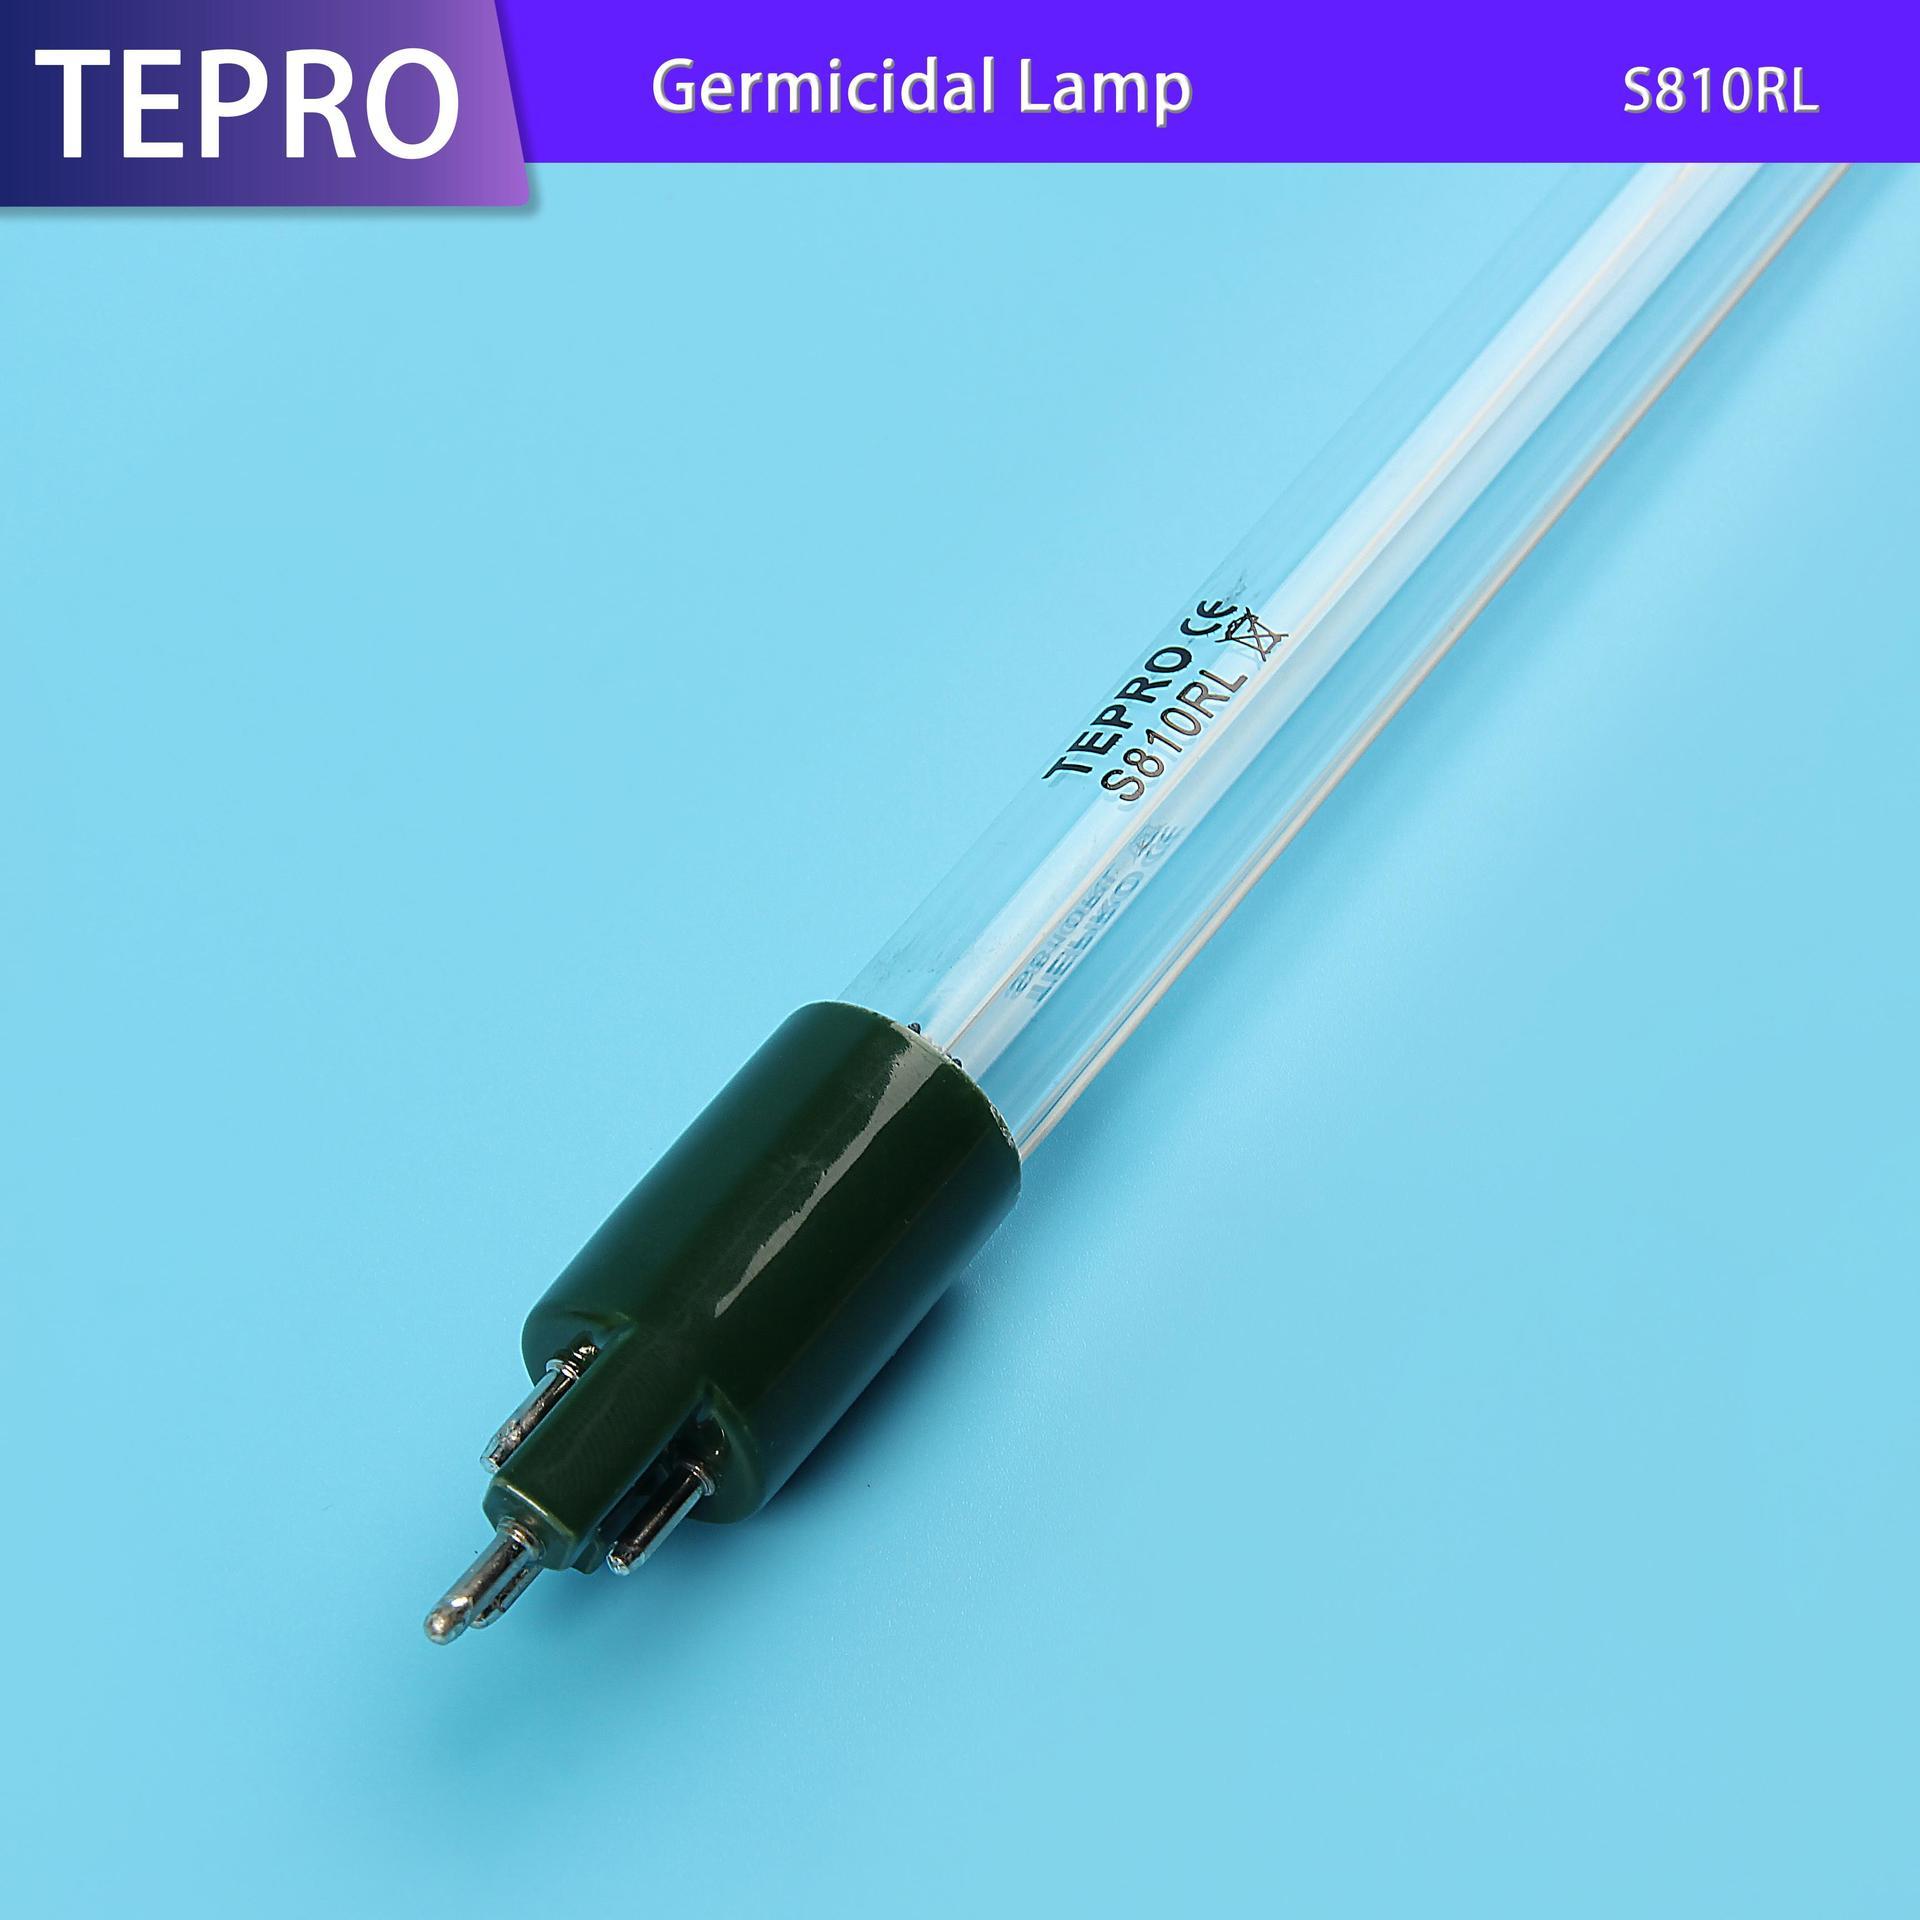 Germicidal Bulb UVC Light 38W S810RL